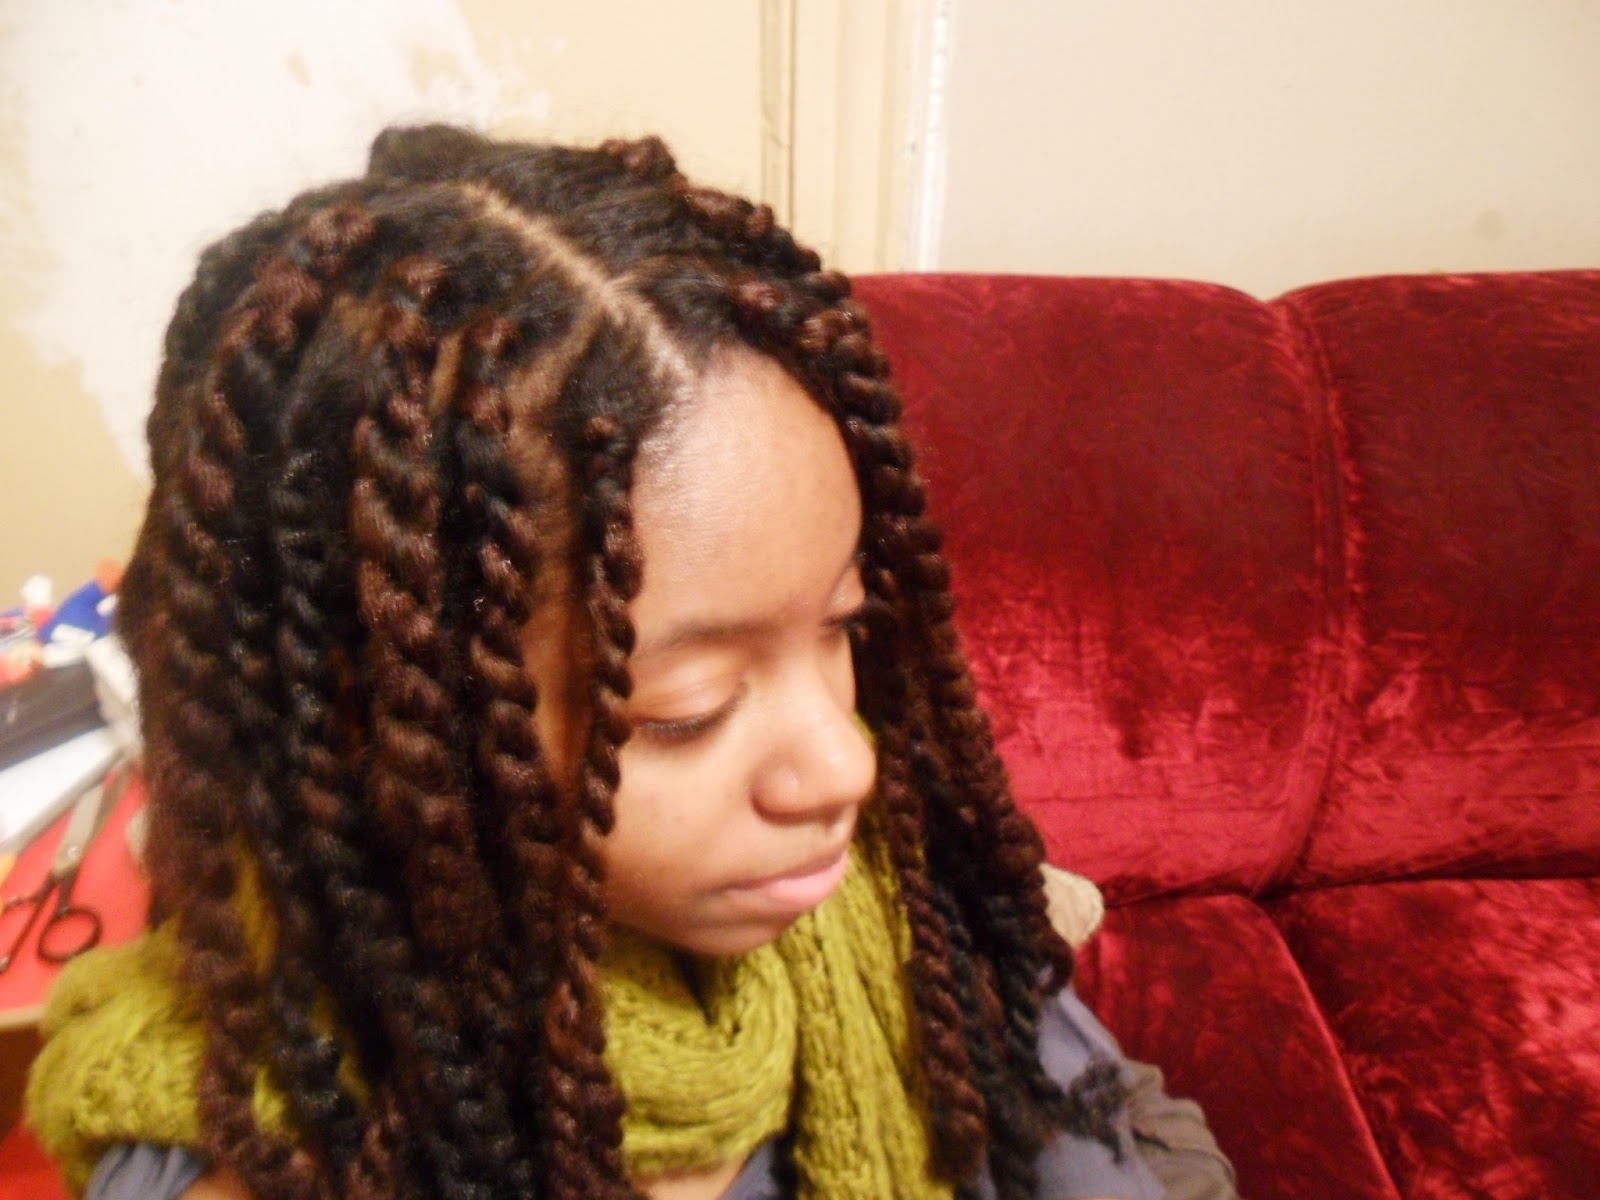 Hair Twist Style: Kearmonie: Doing Havana/Marley Twists For The First Time